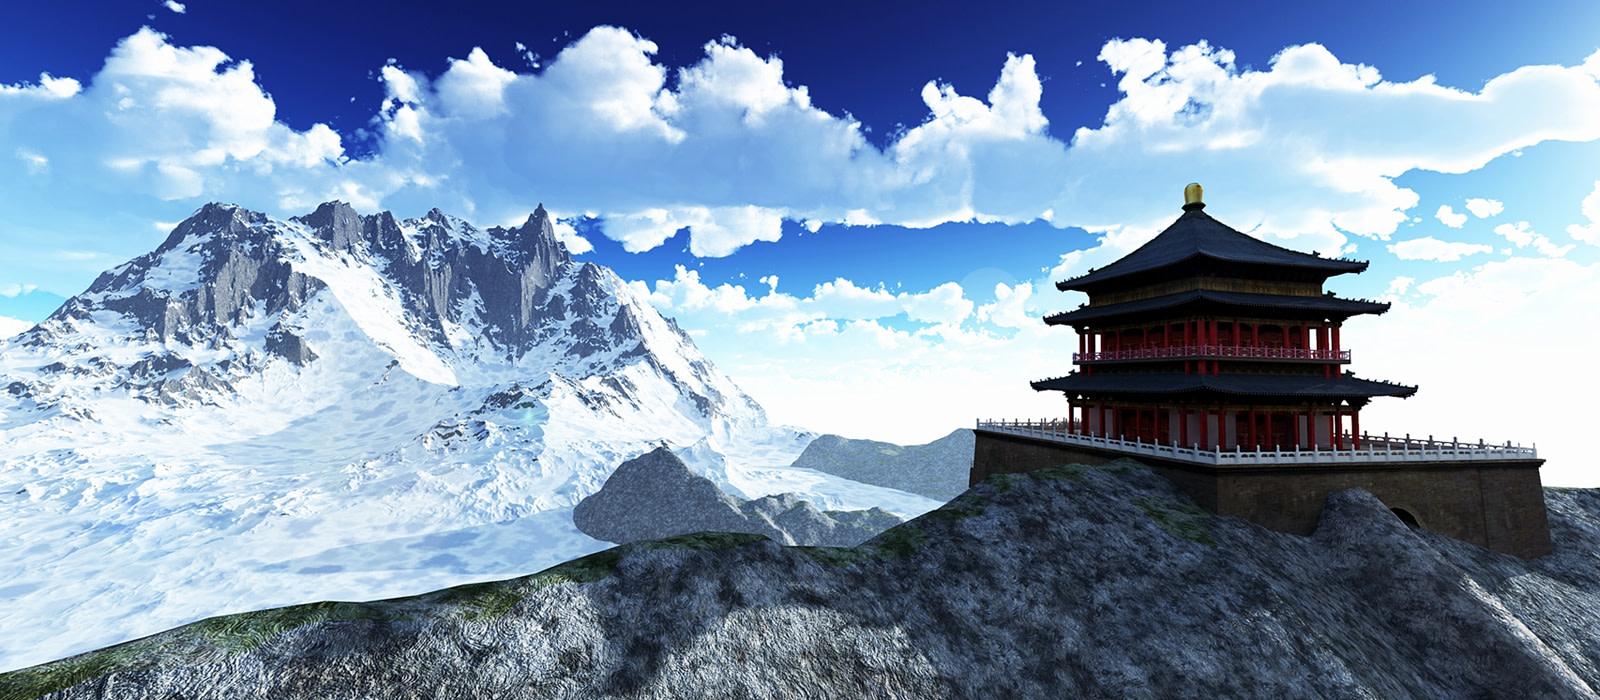 Sun temple Buddhist shrine-in-the-Himalayas-Bhutan-Asia